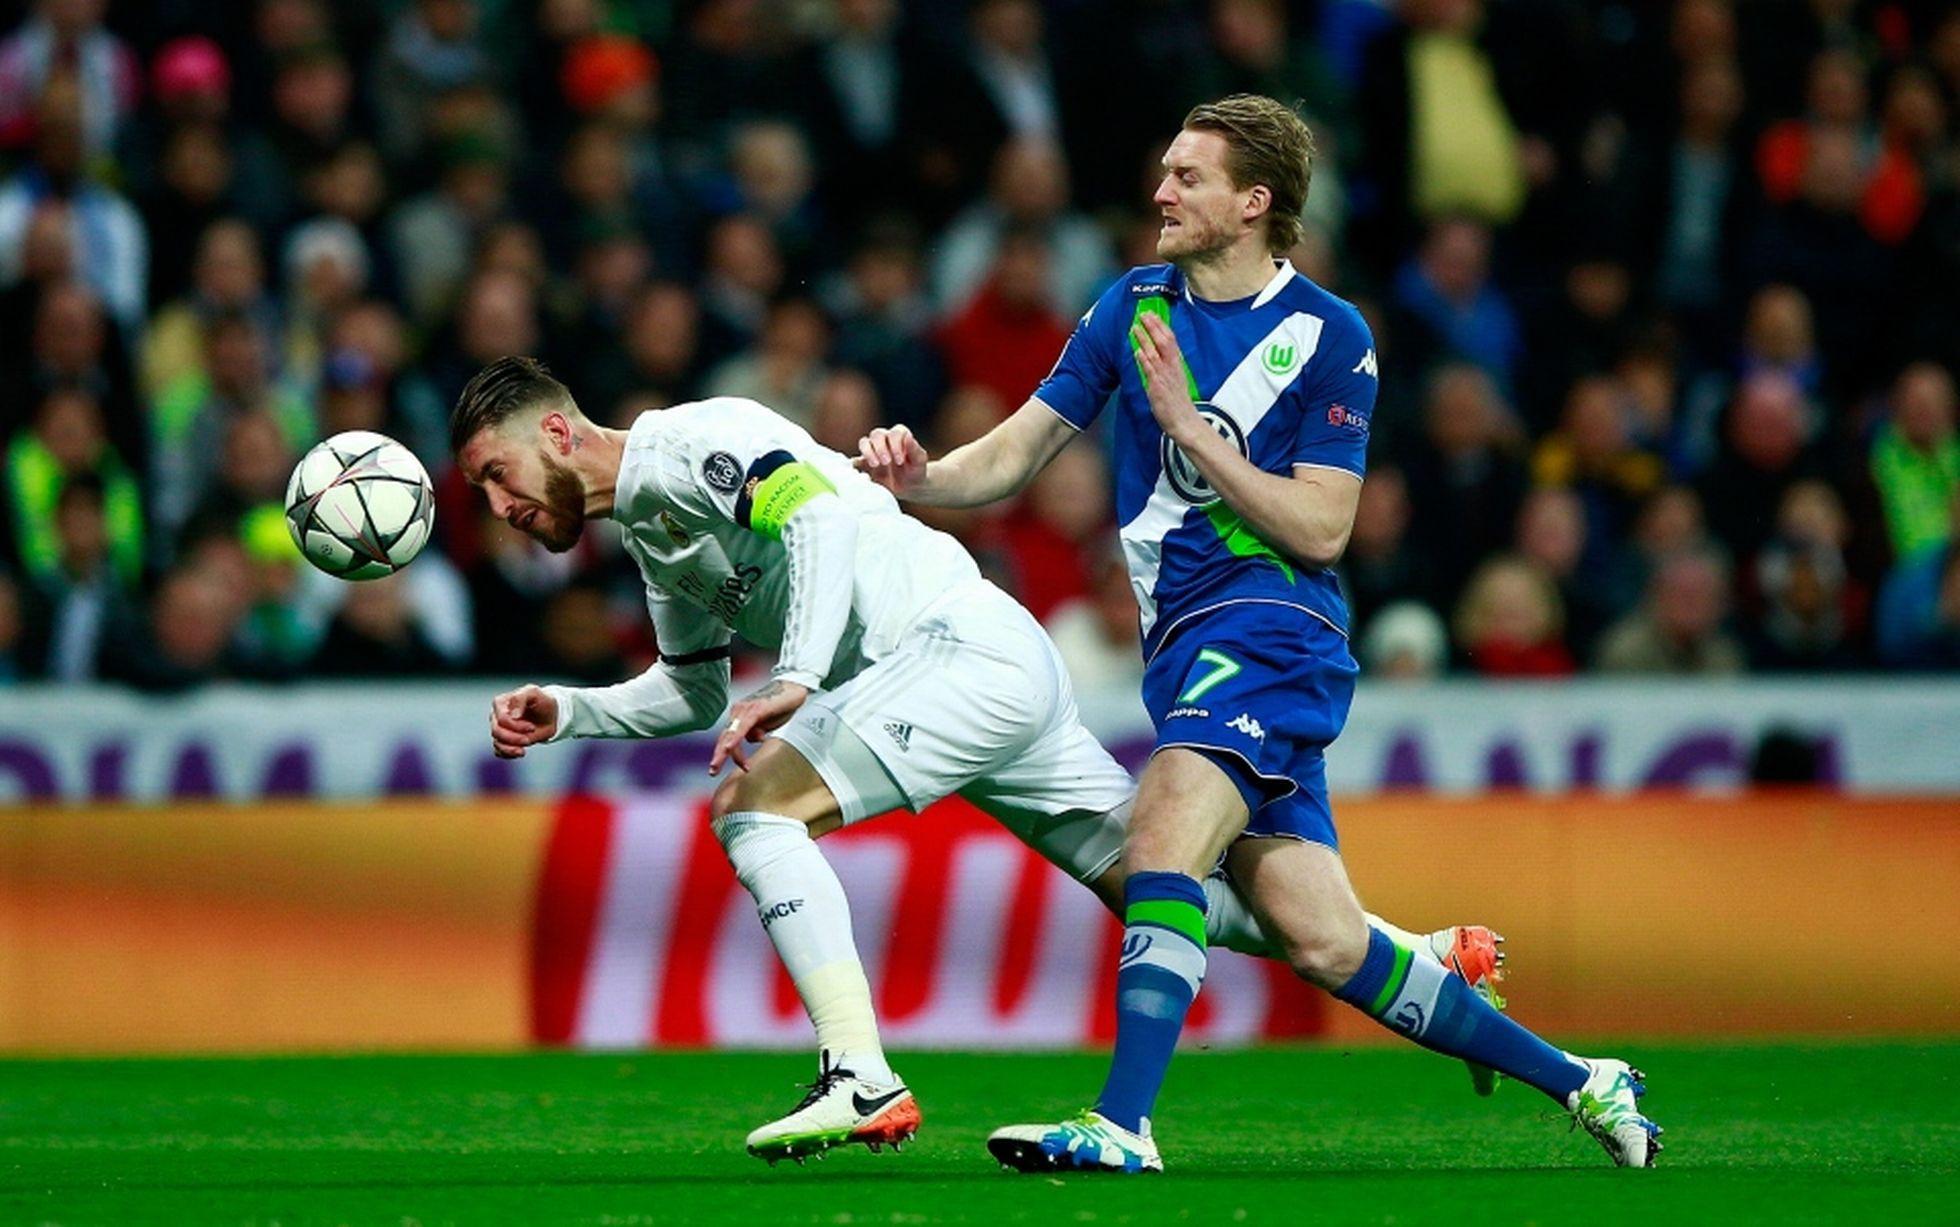 Madrid Vs Wolfsburg